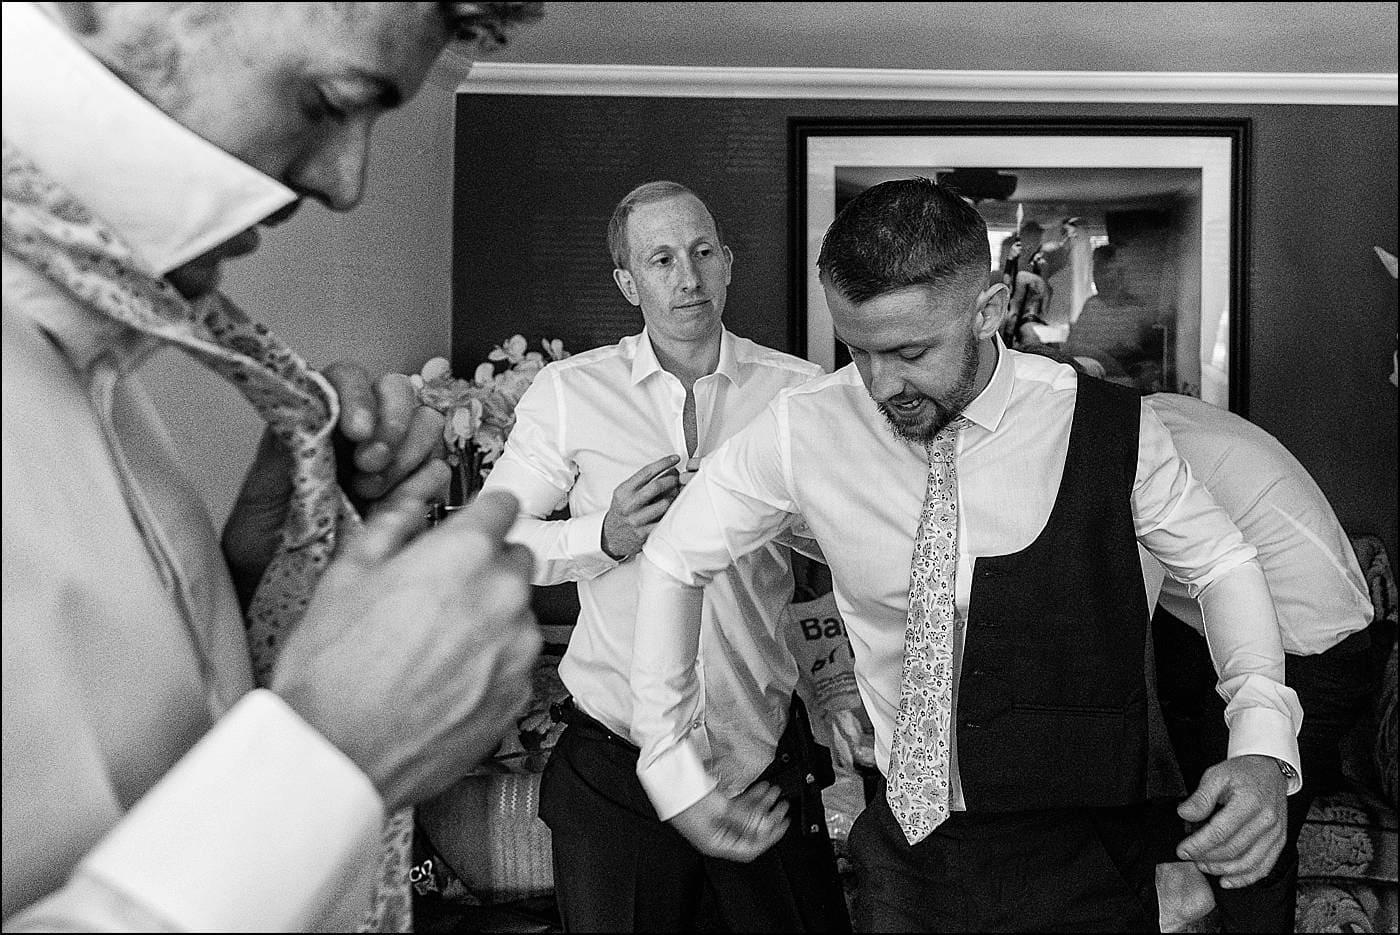 Grroms men getting ready